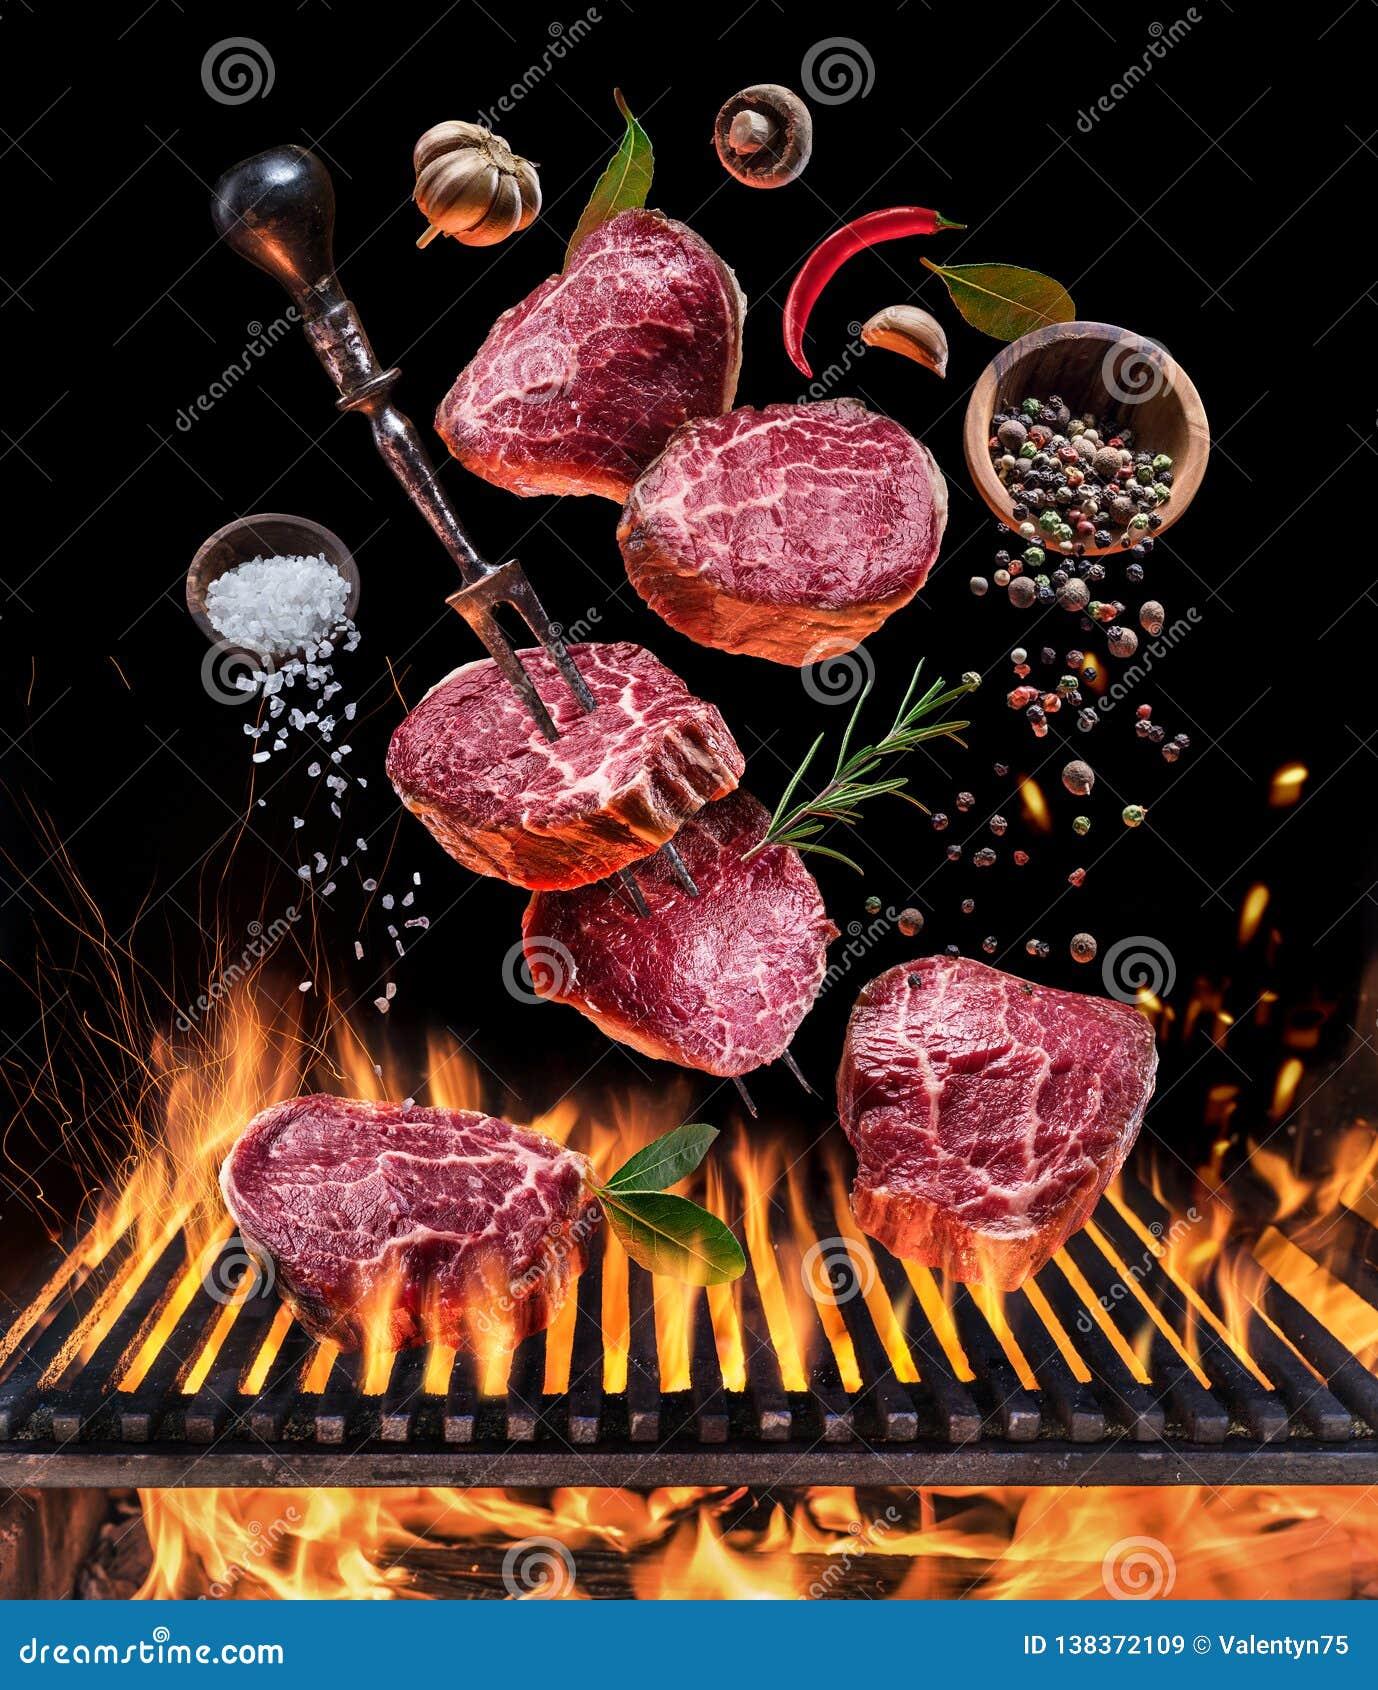 Lapje vlees het koken Conceptueel beeld Lapje vlees met kruiden en bestek onder brandende grillrooster